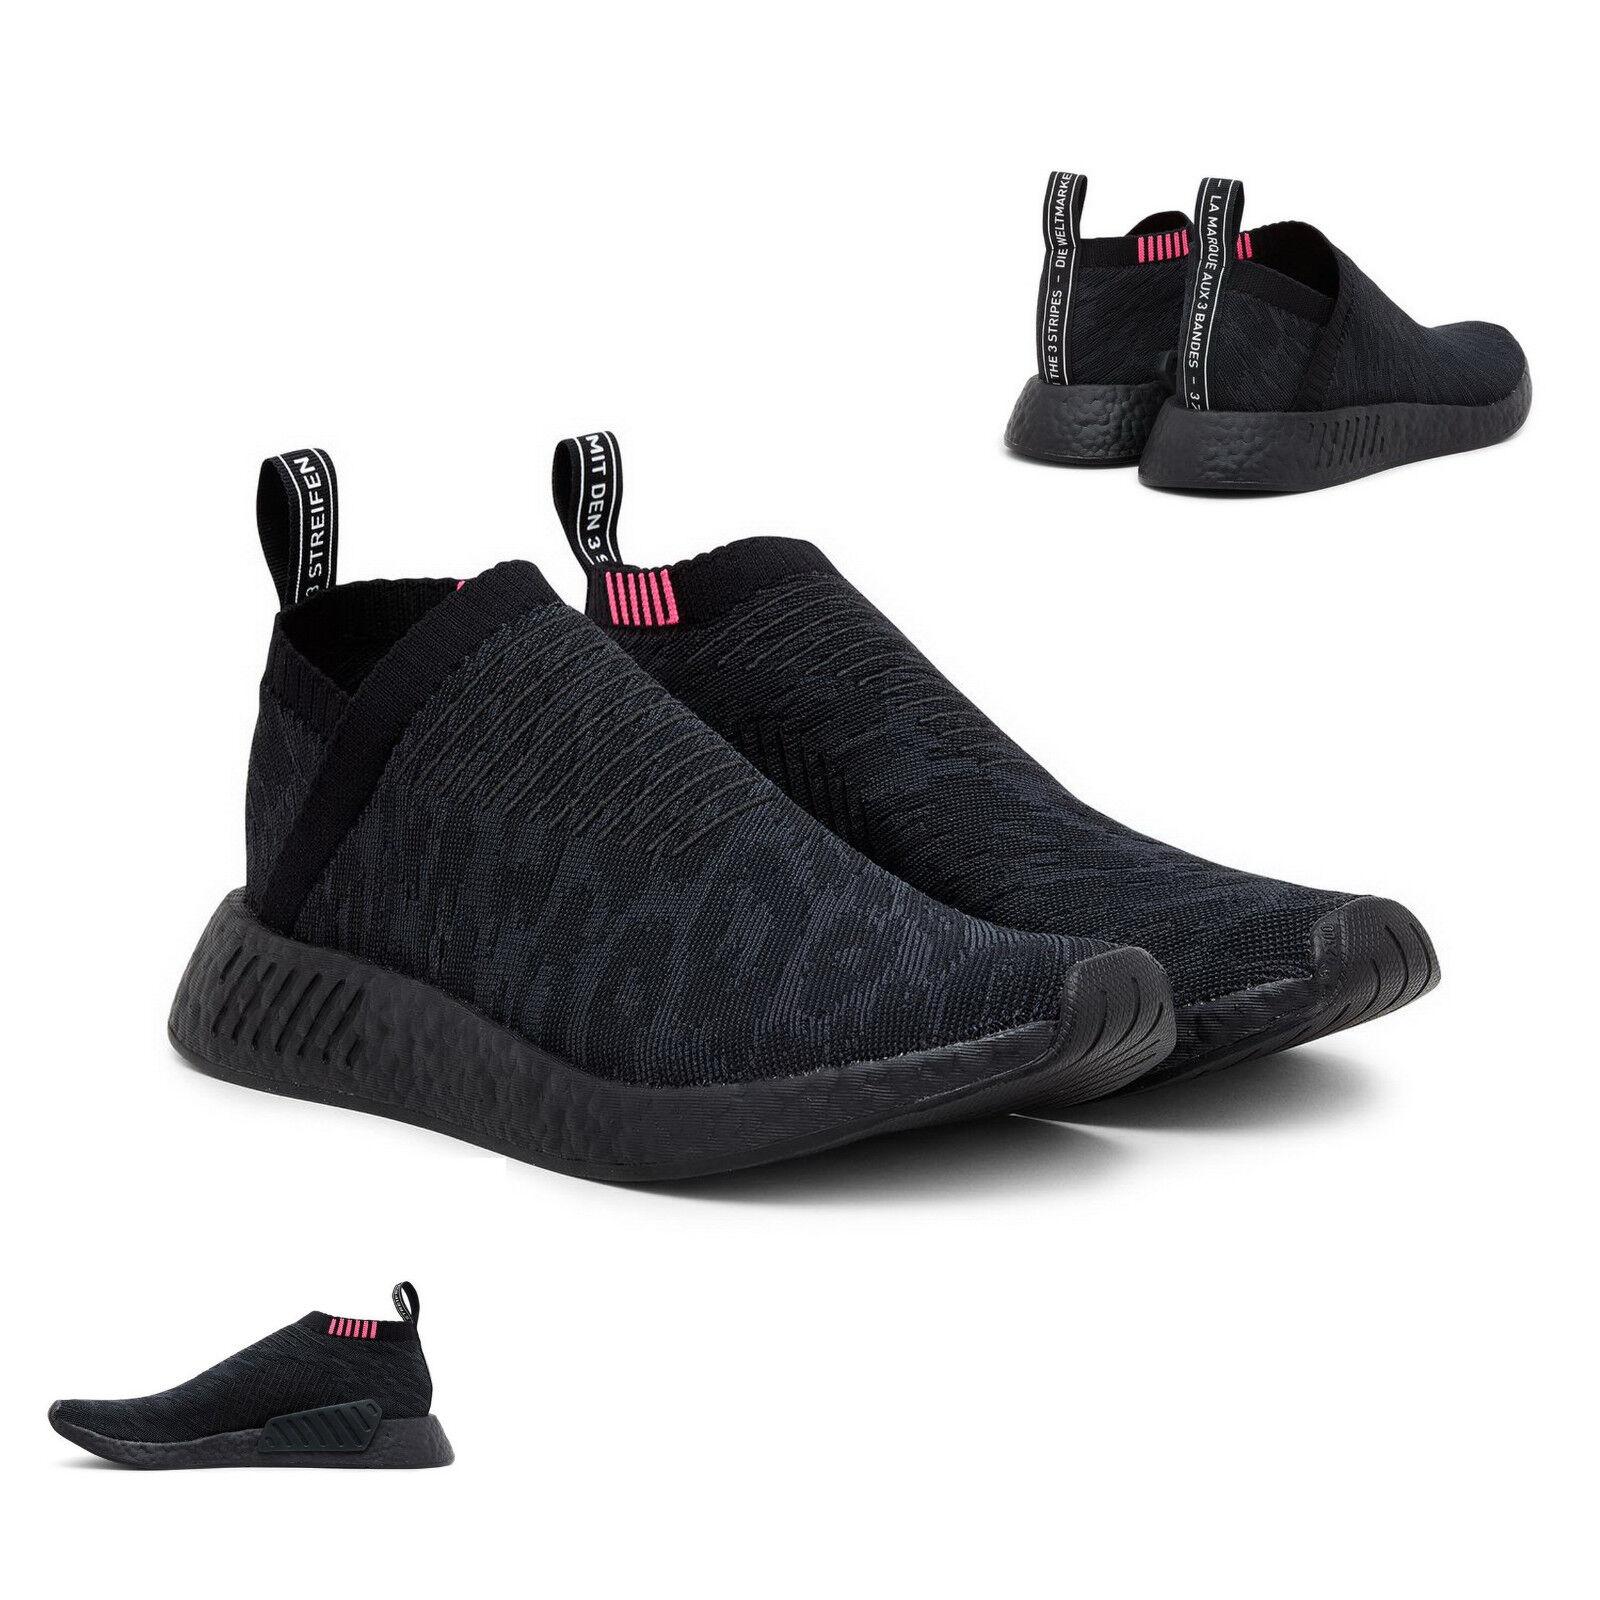 ADIDAS NMD cs2 PK Primeknit citysock Sneaker cq2373 Nero